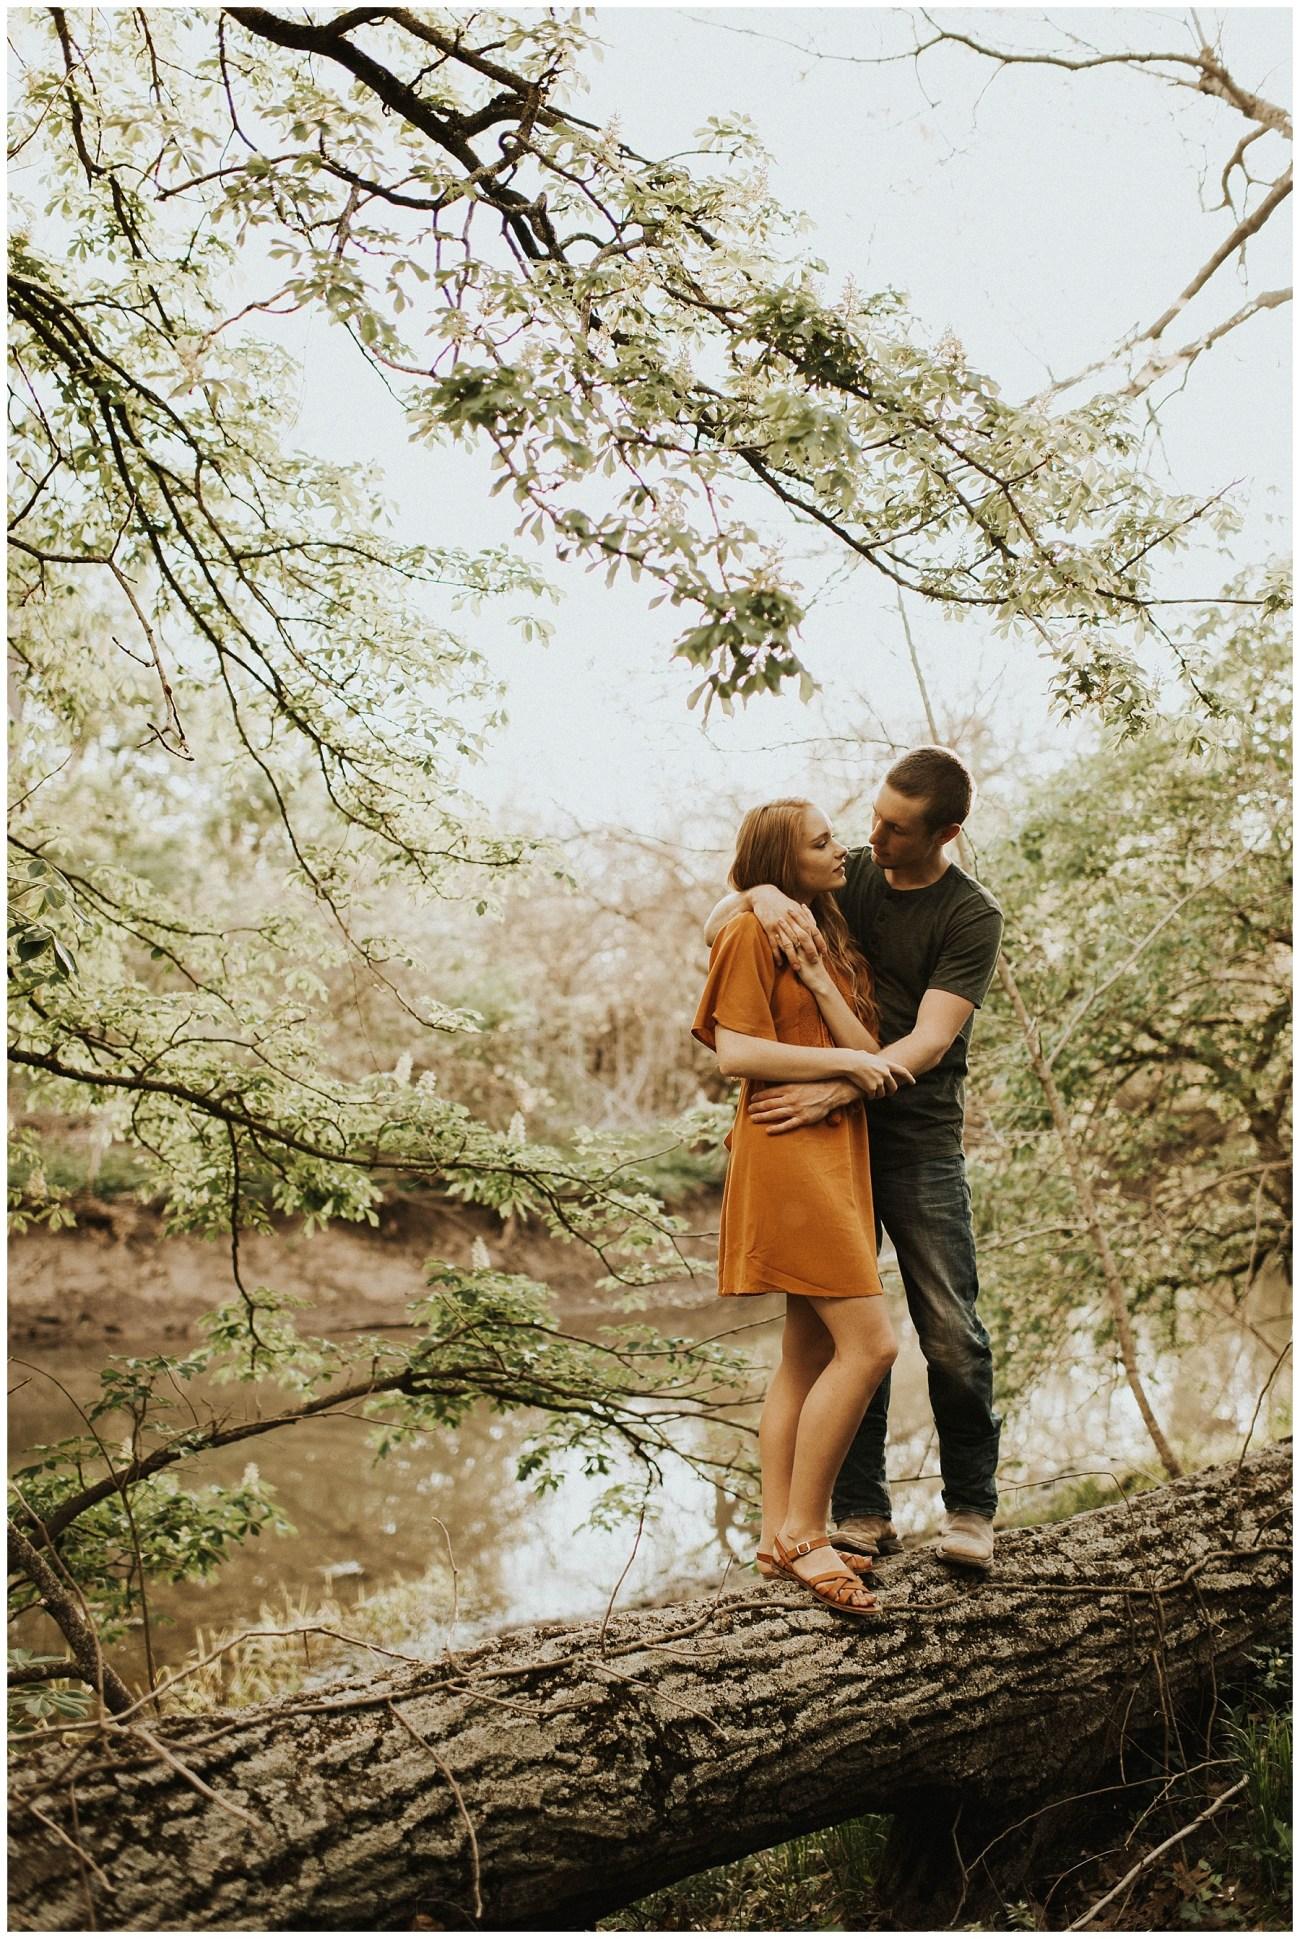 Nelson + Kendra // Warm Summer Engagements - Lauren F